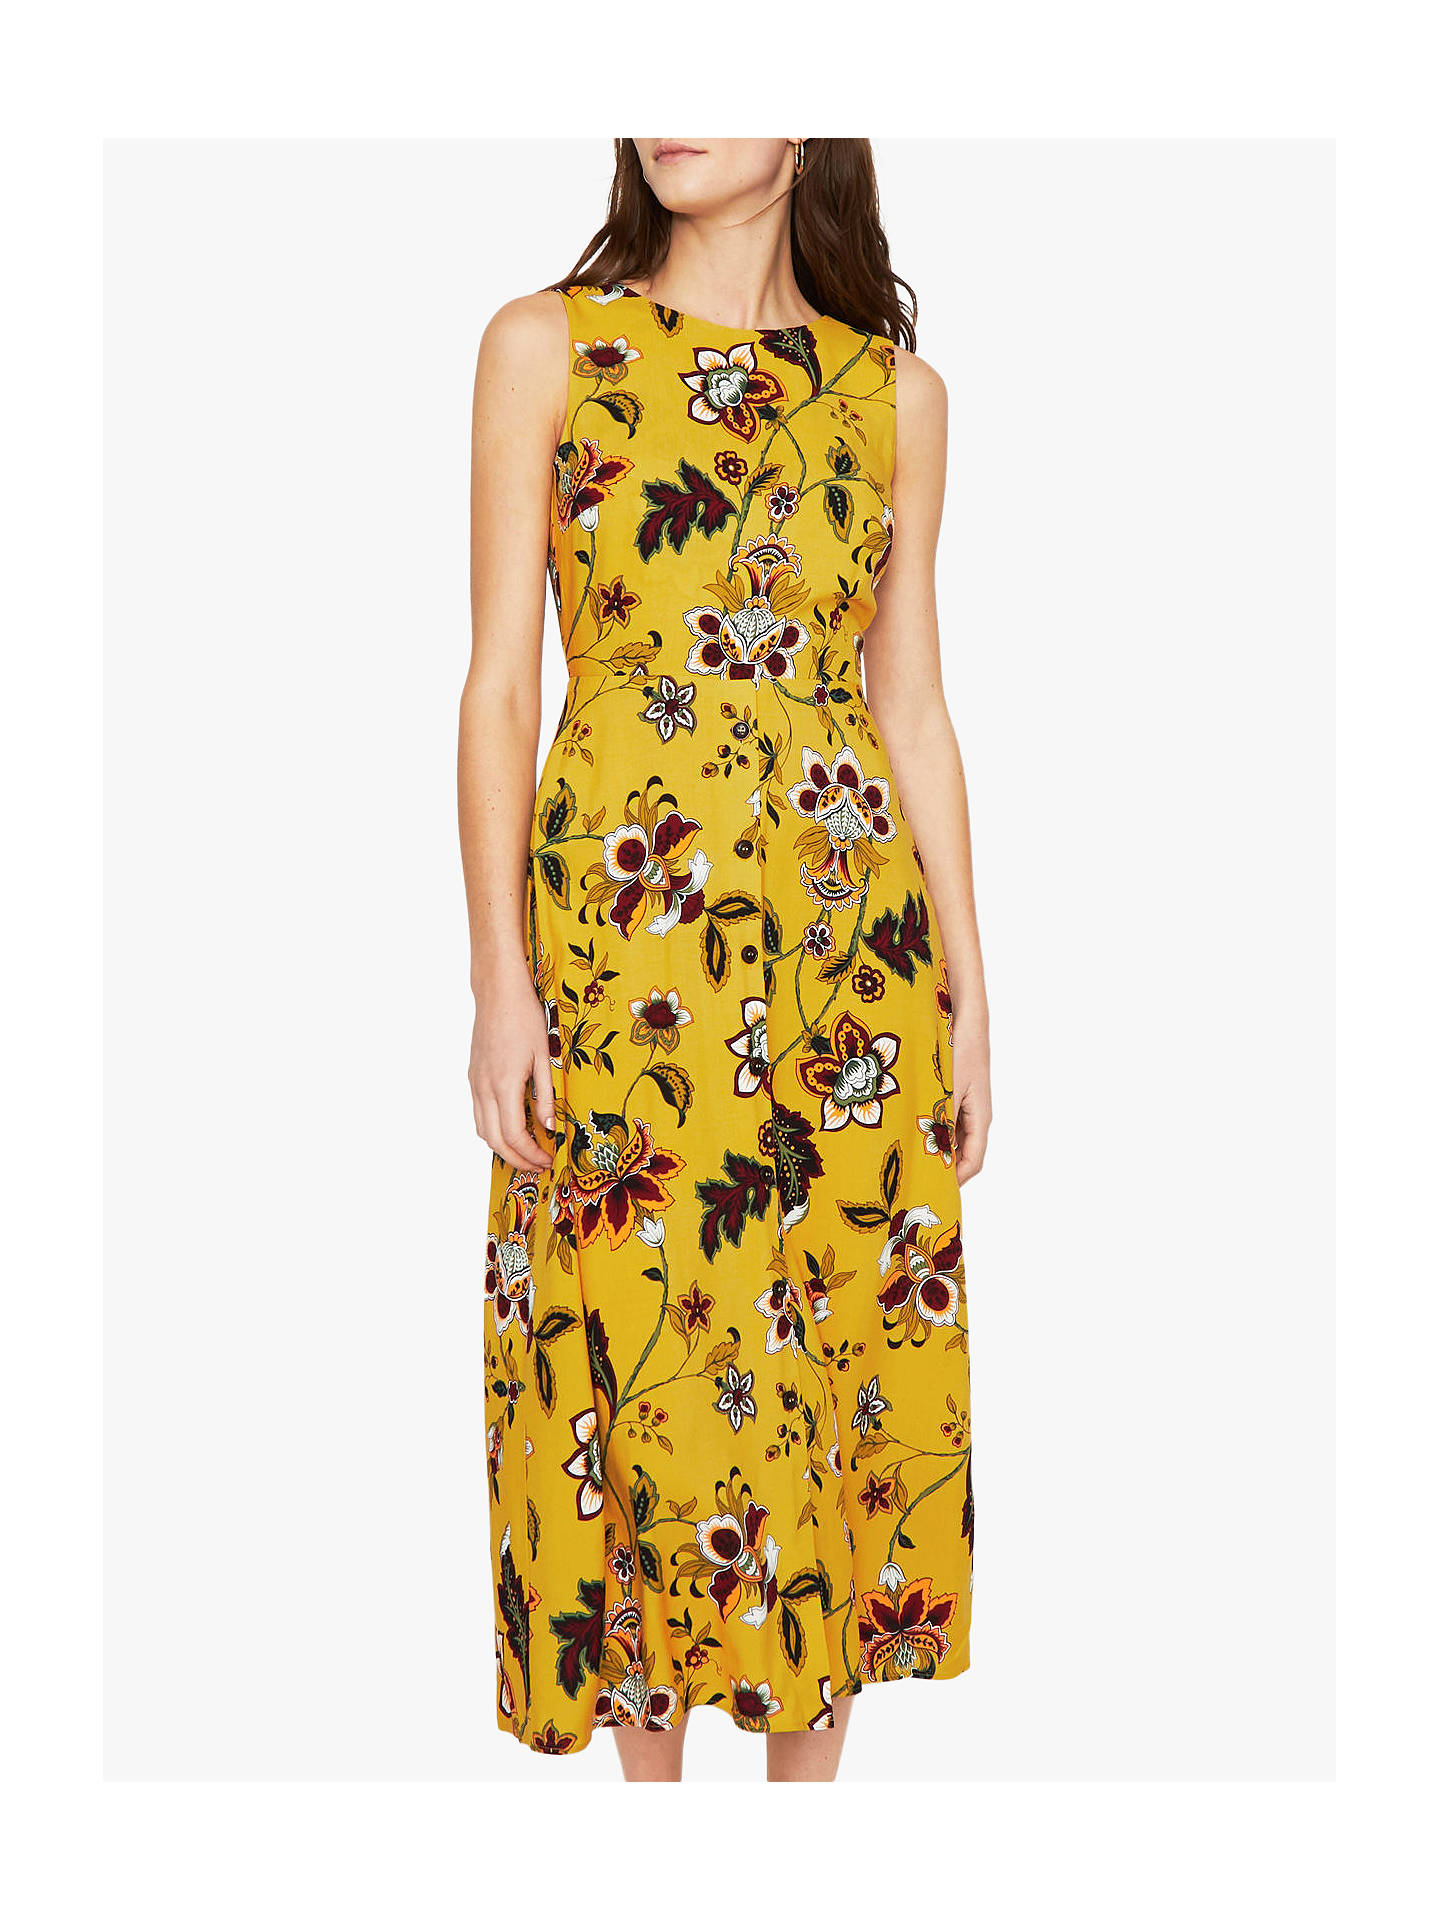 a6fbeced0217 Buy Warehouse Paisley Floral Midi Sleeveless Dress